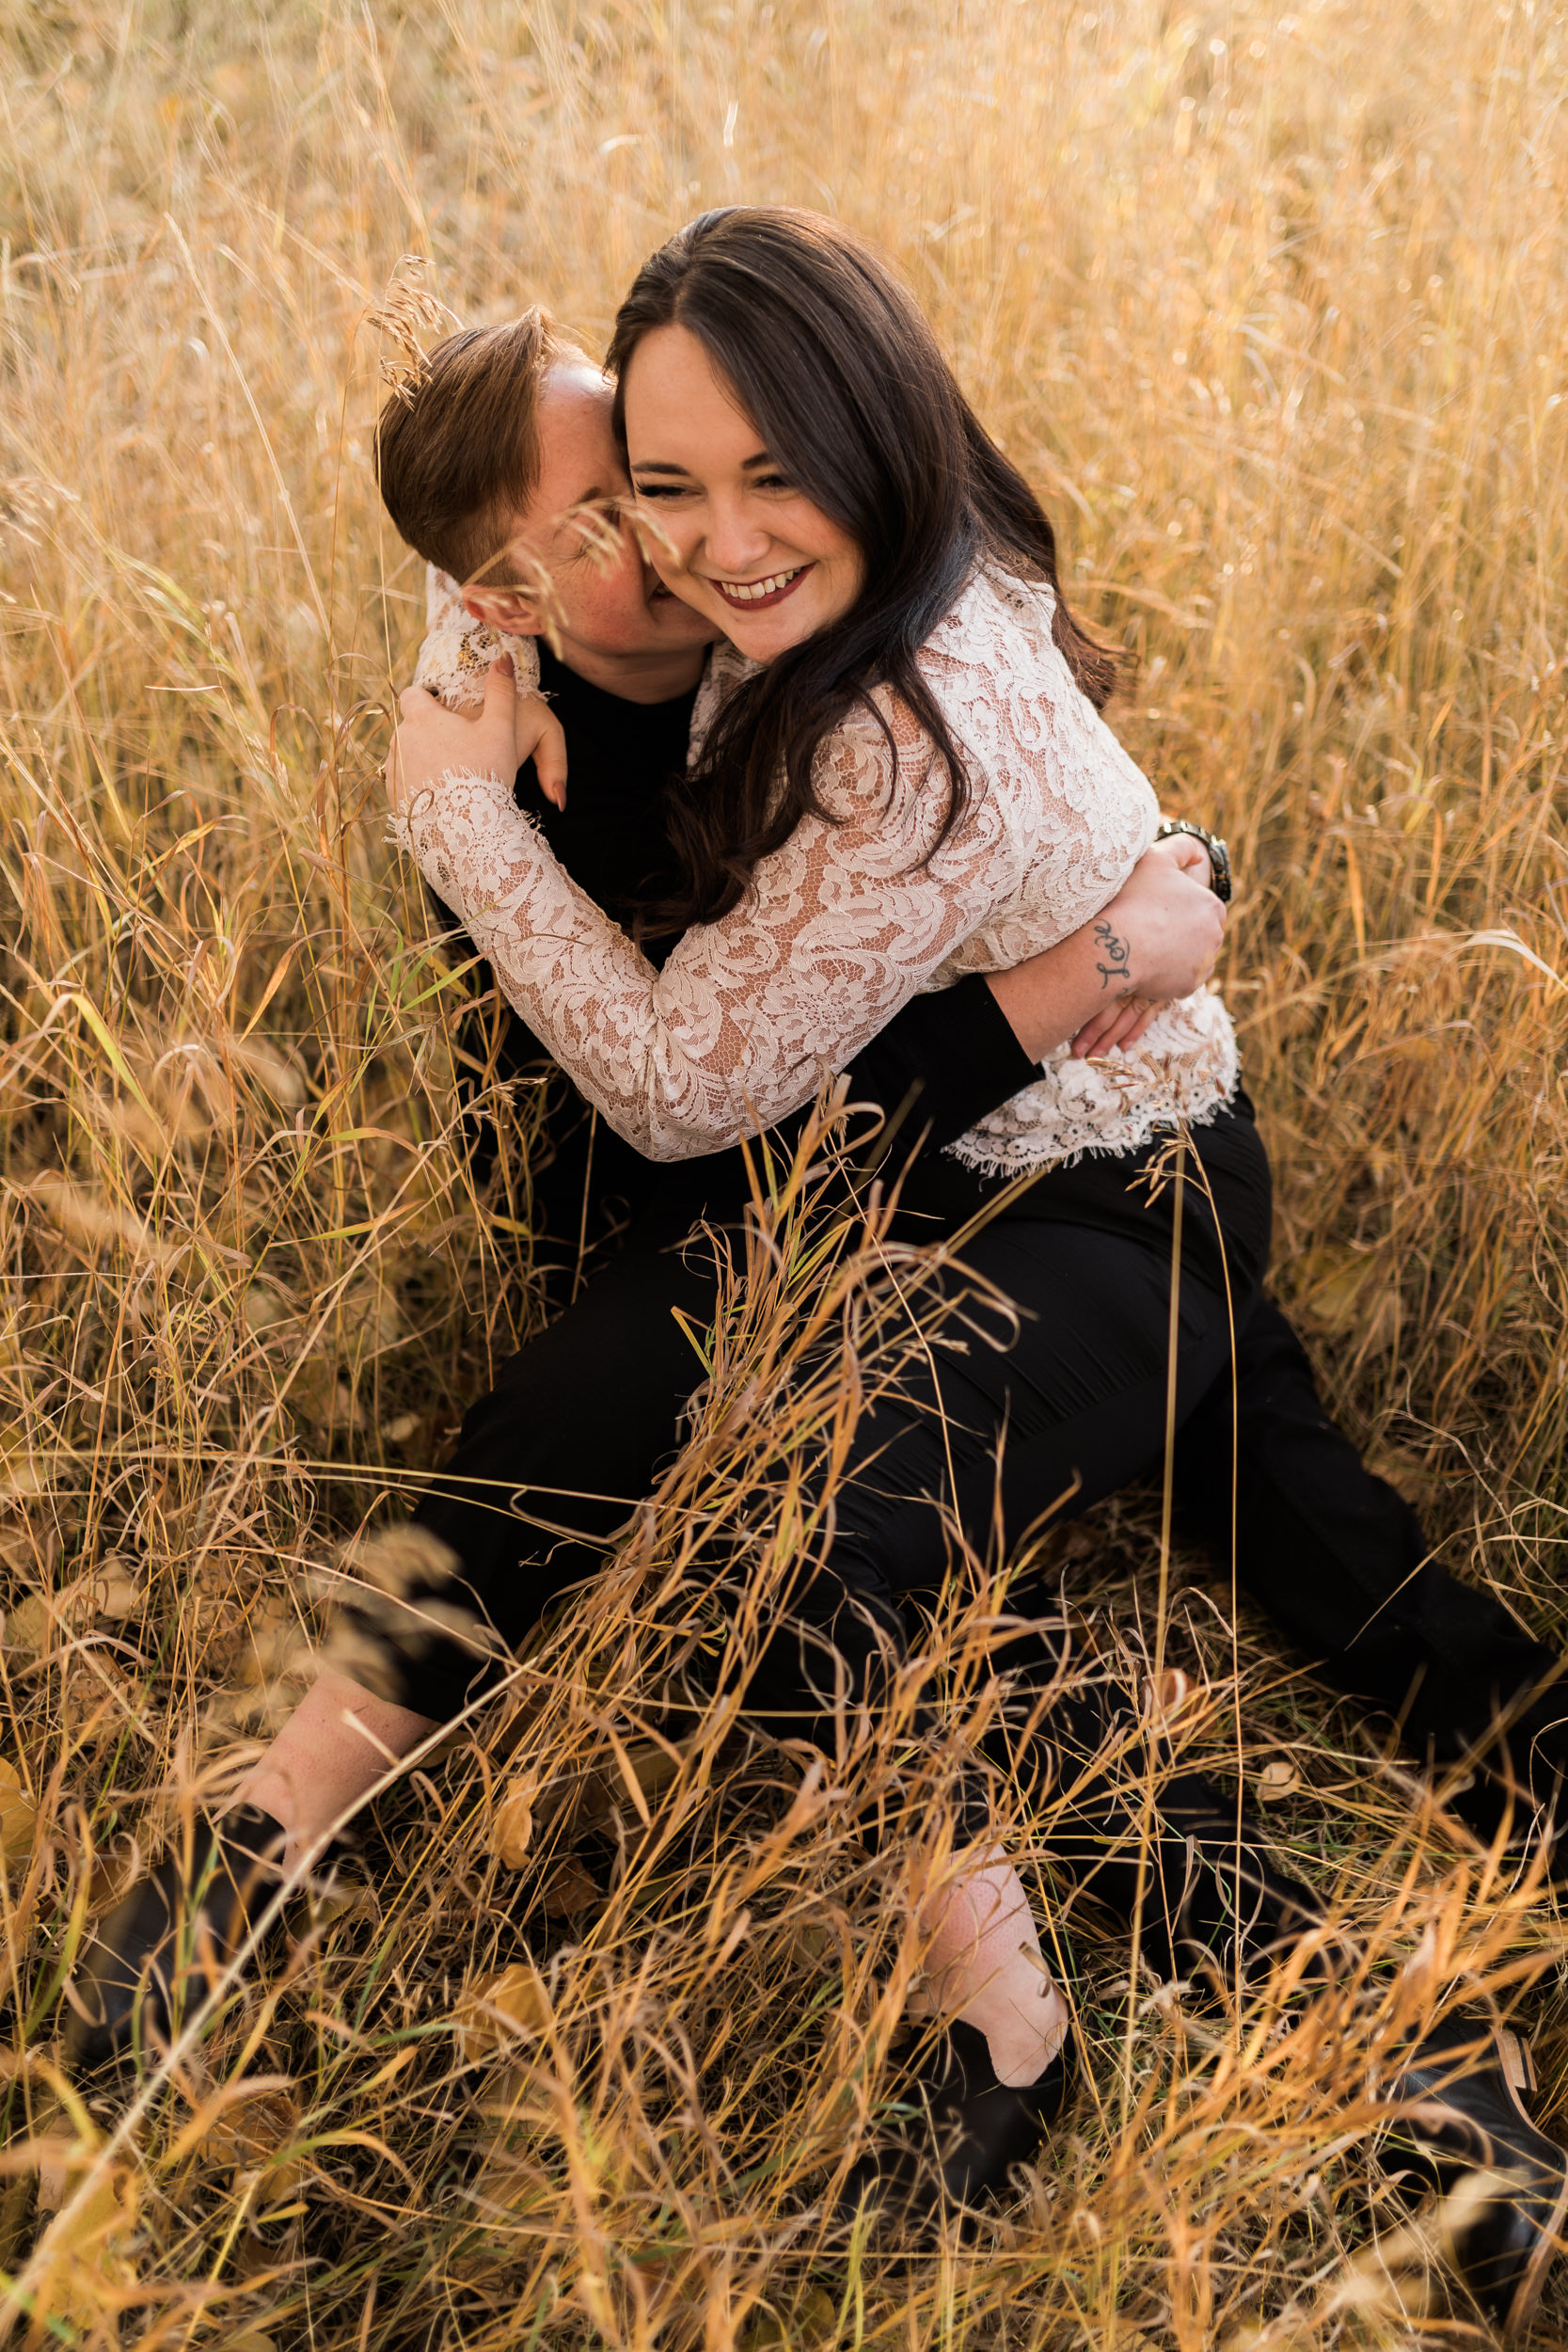 Calgary-wedding-photographers-photos-banff-engagement-36.jpg